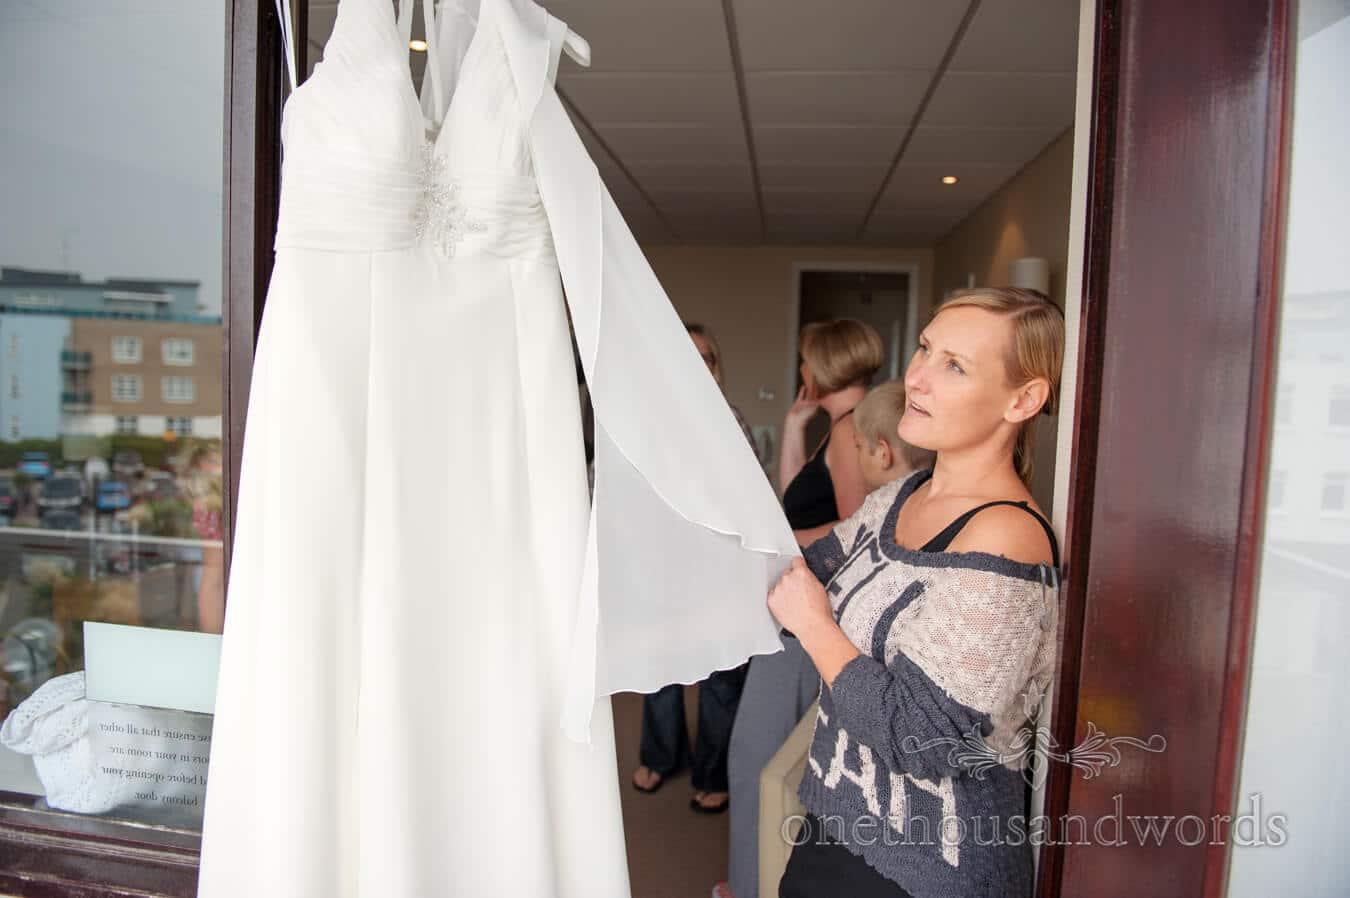 Bridesmaid looks at wedding dress at Sandbanks Hotel wedding morning